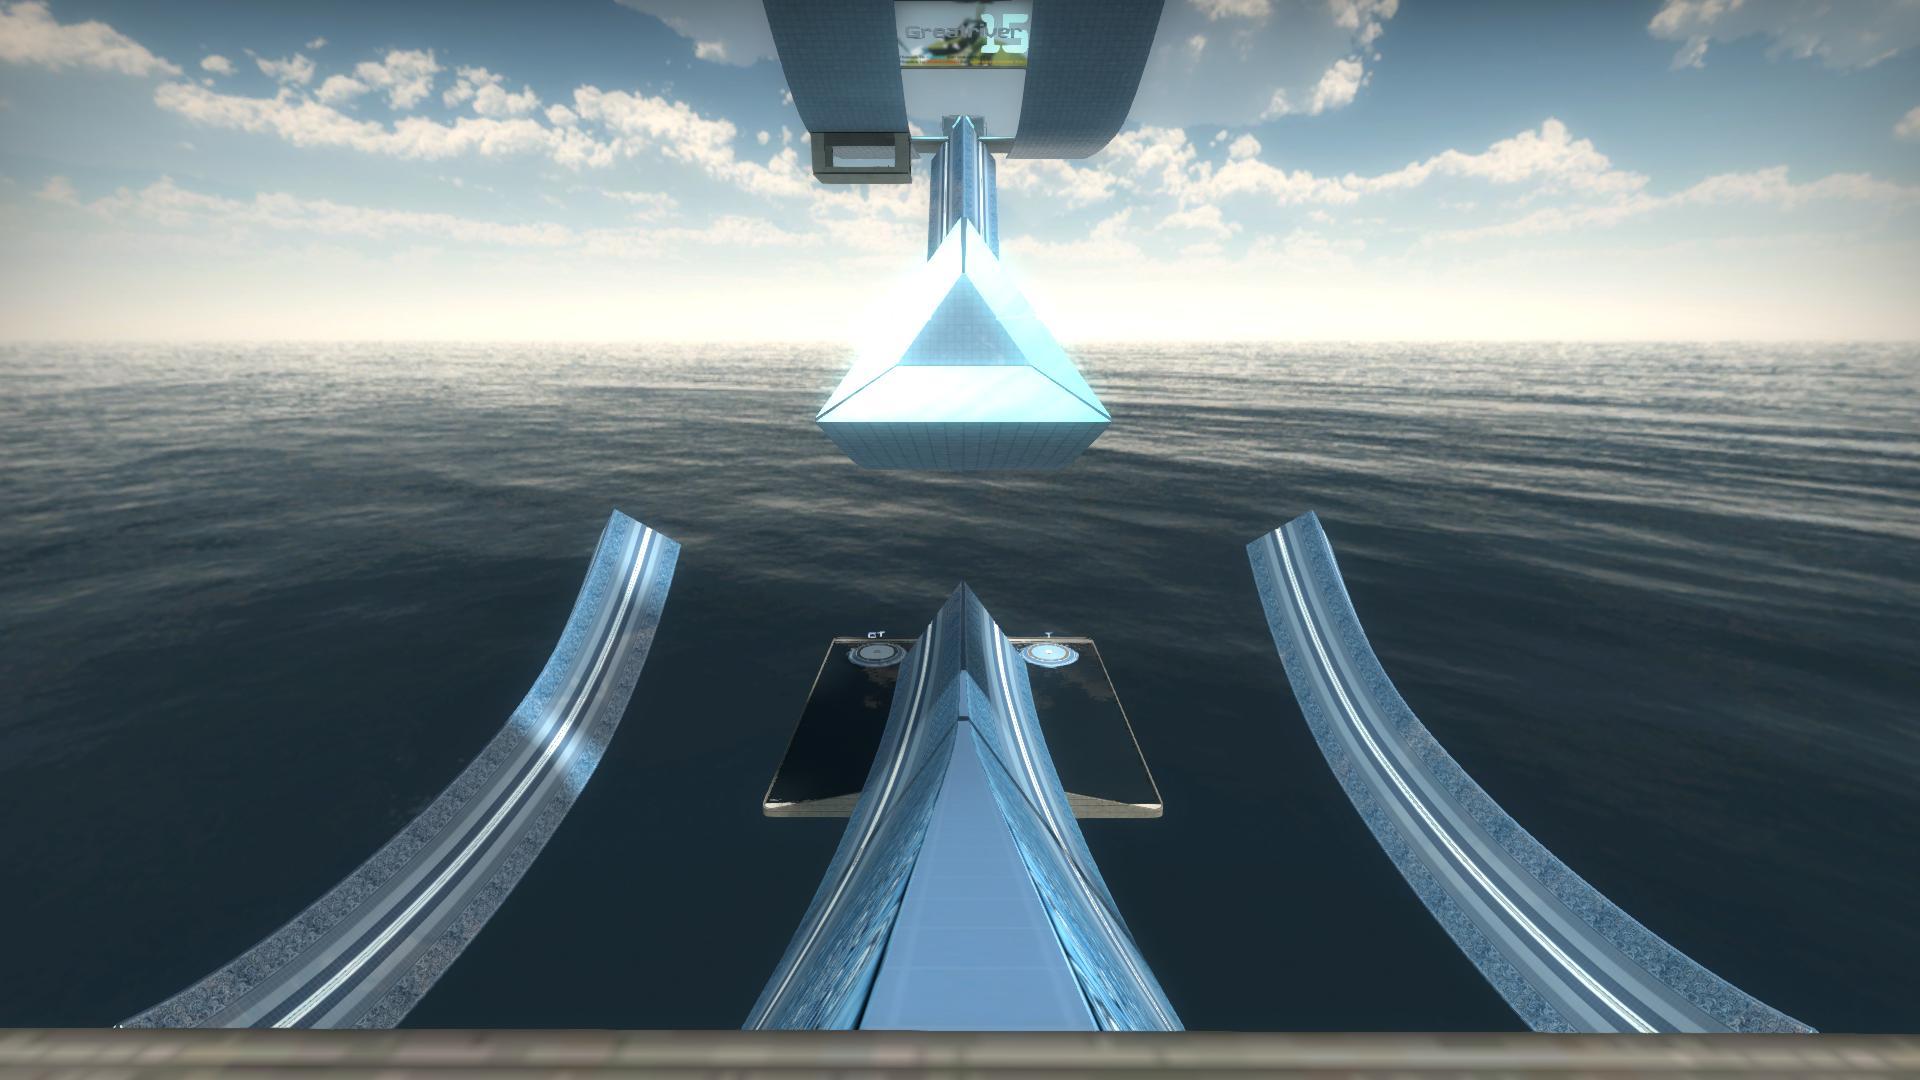 csgo surfing download